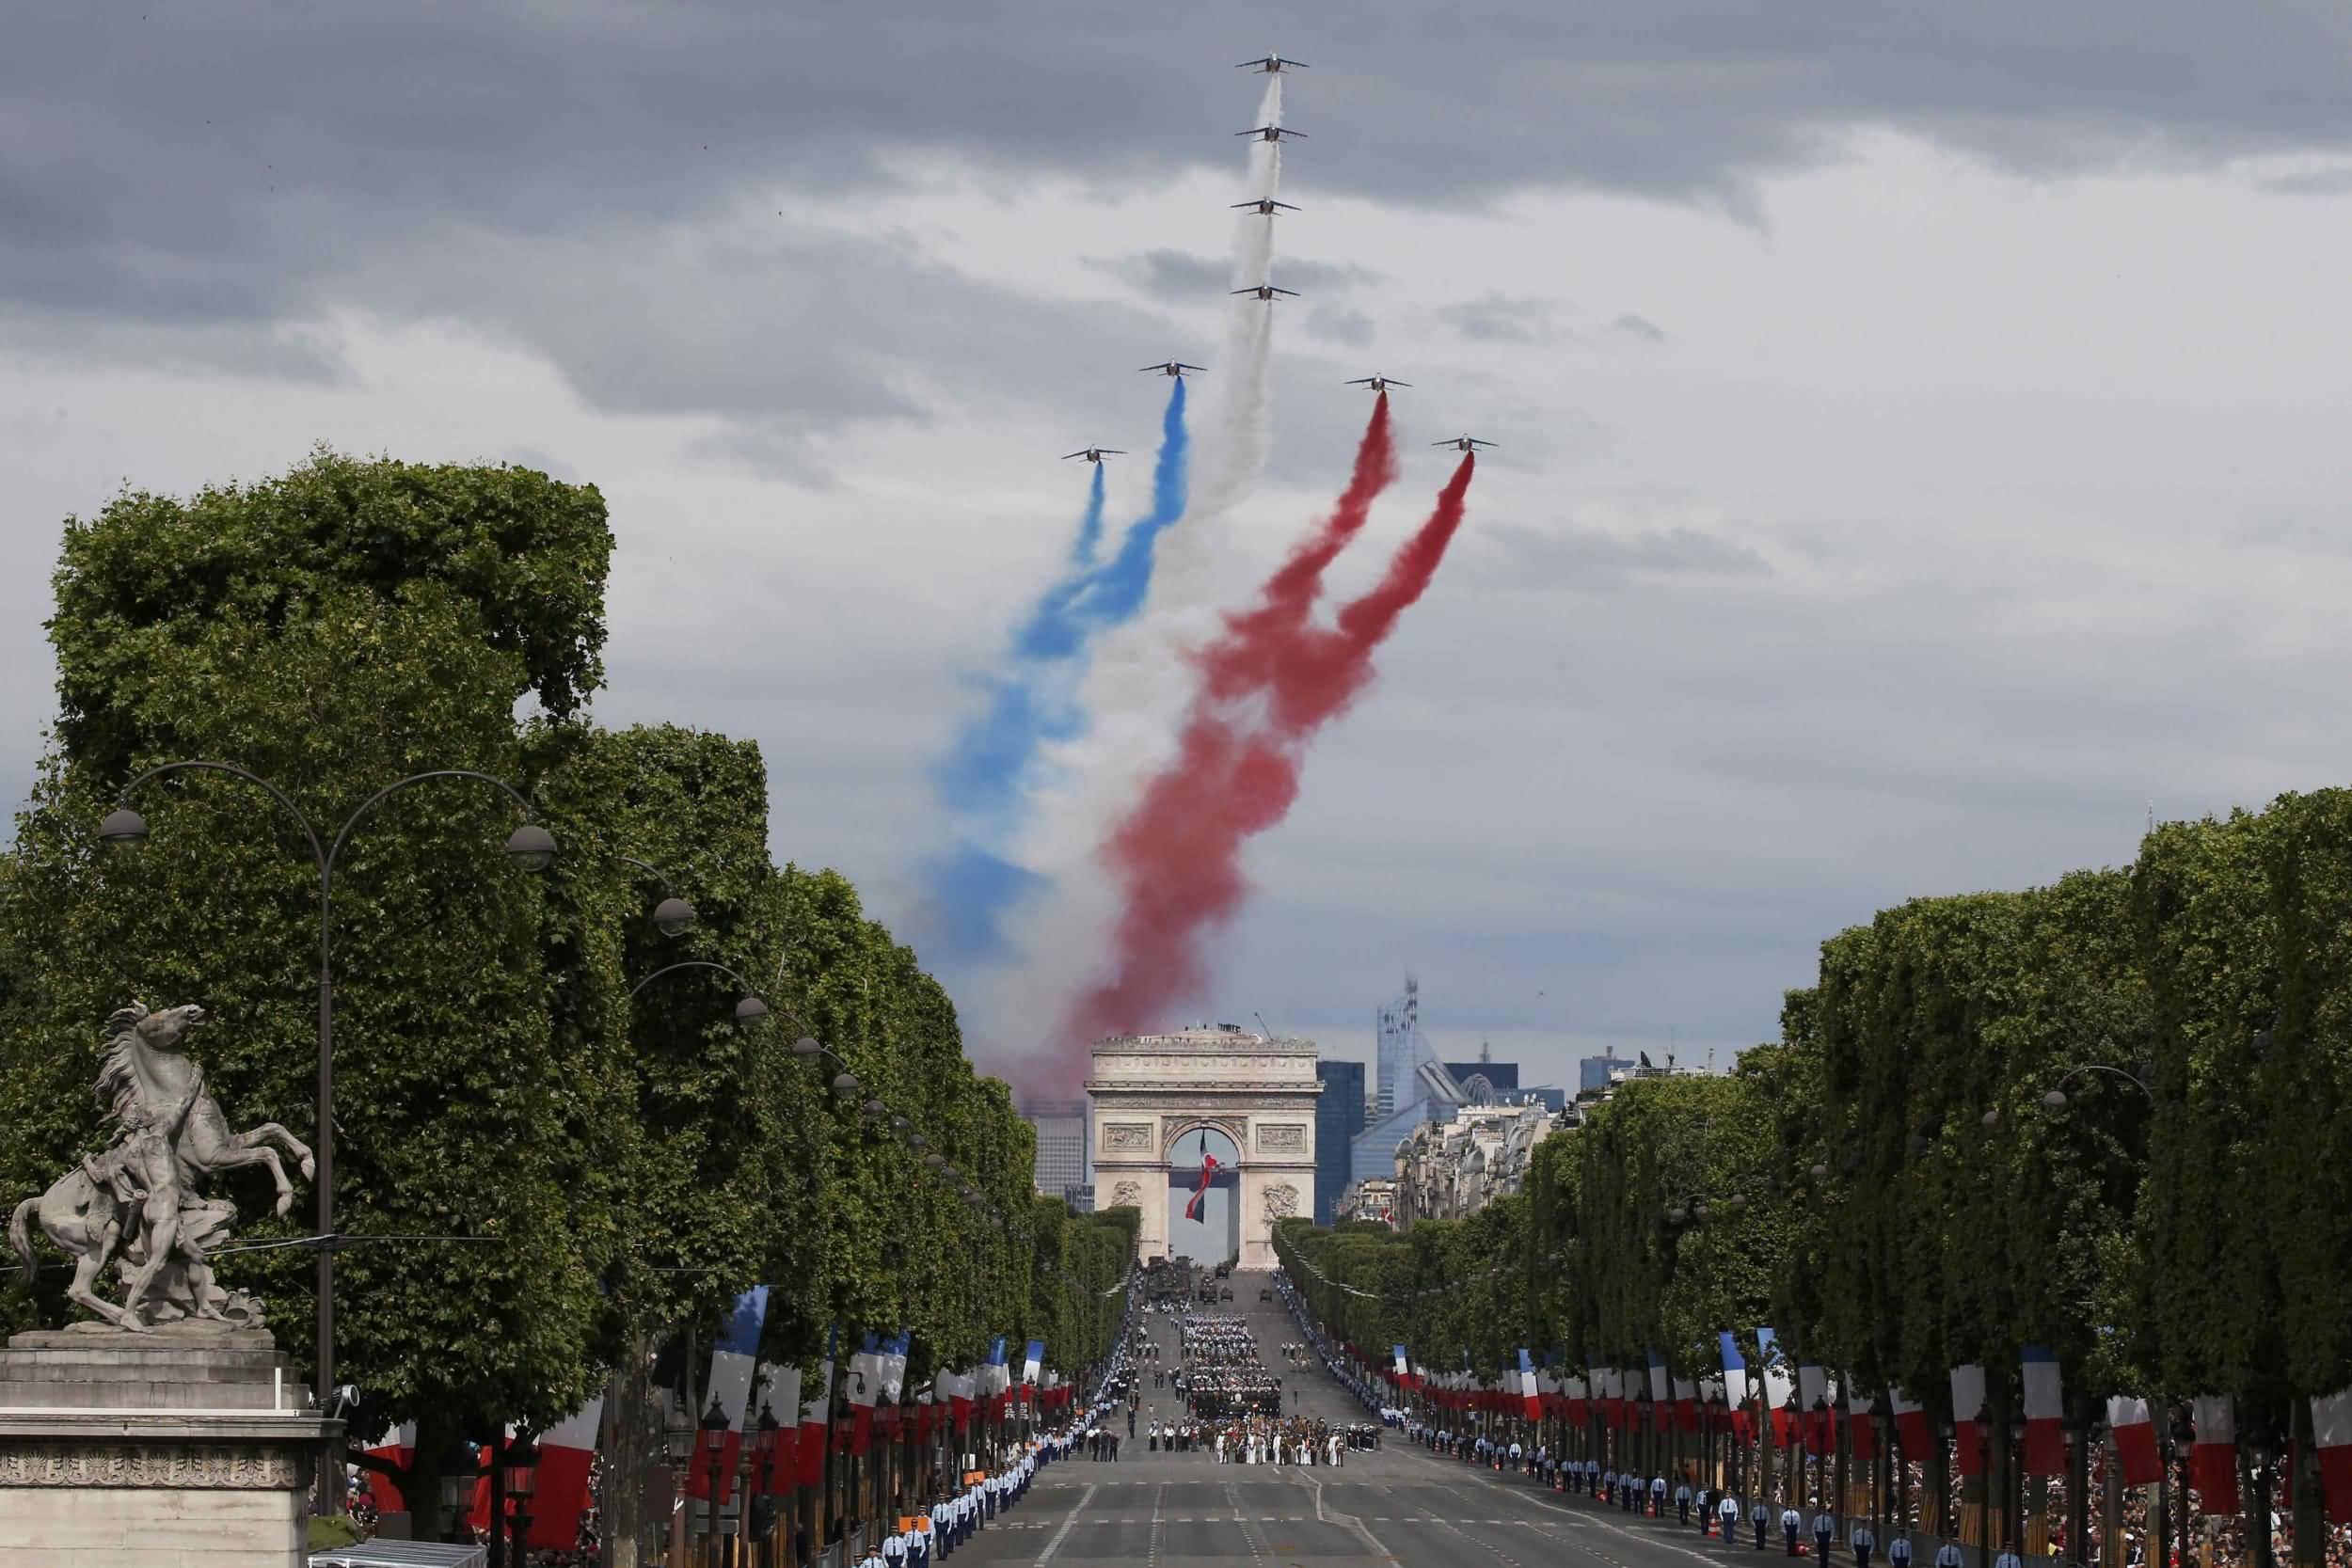 bastille day - photo #11